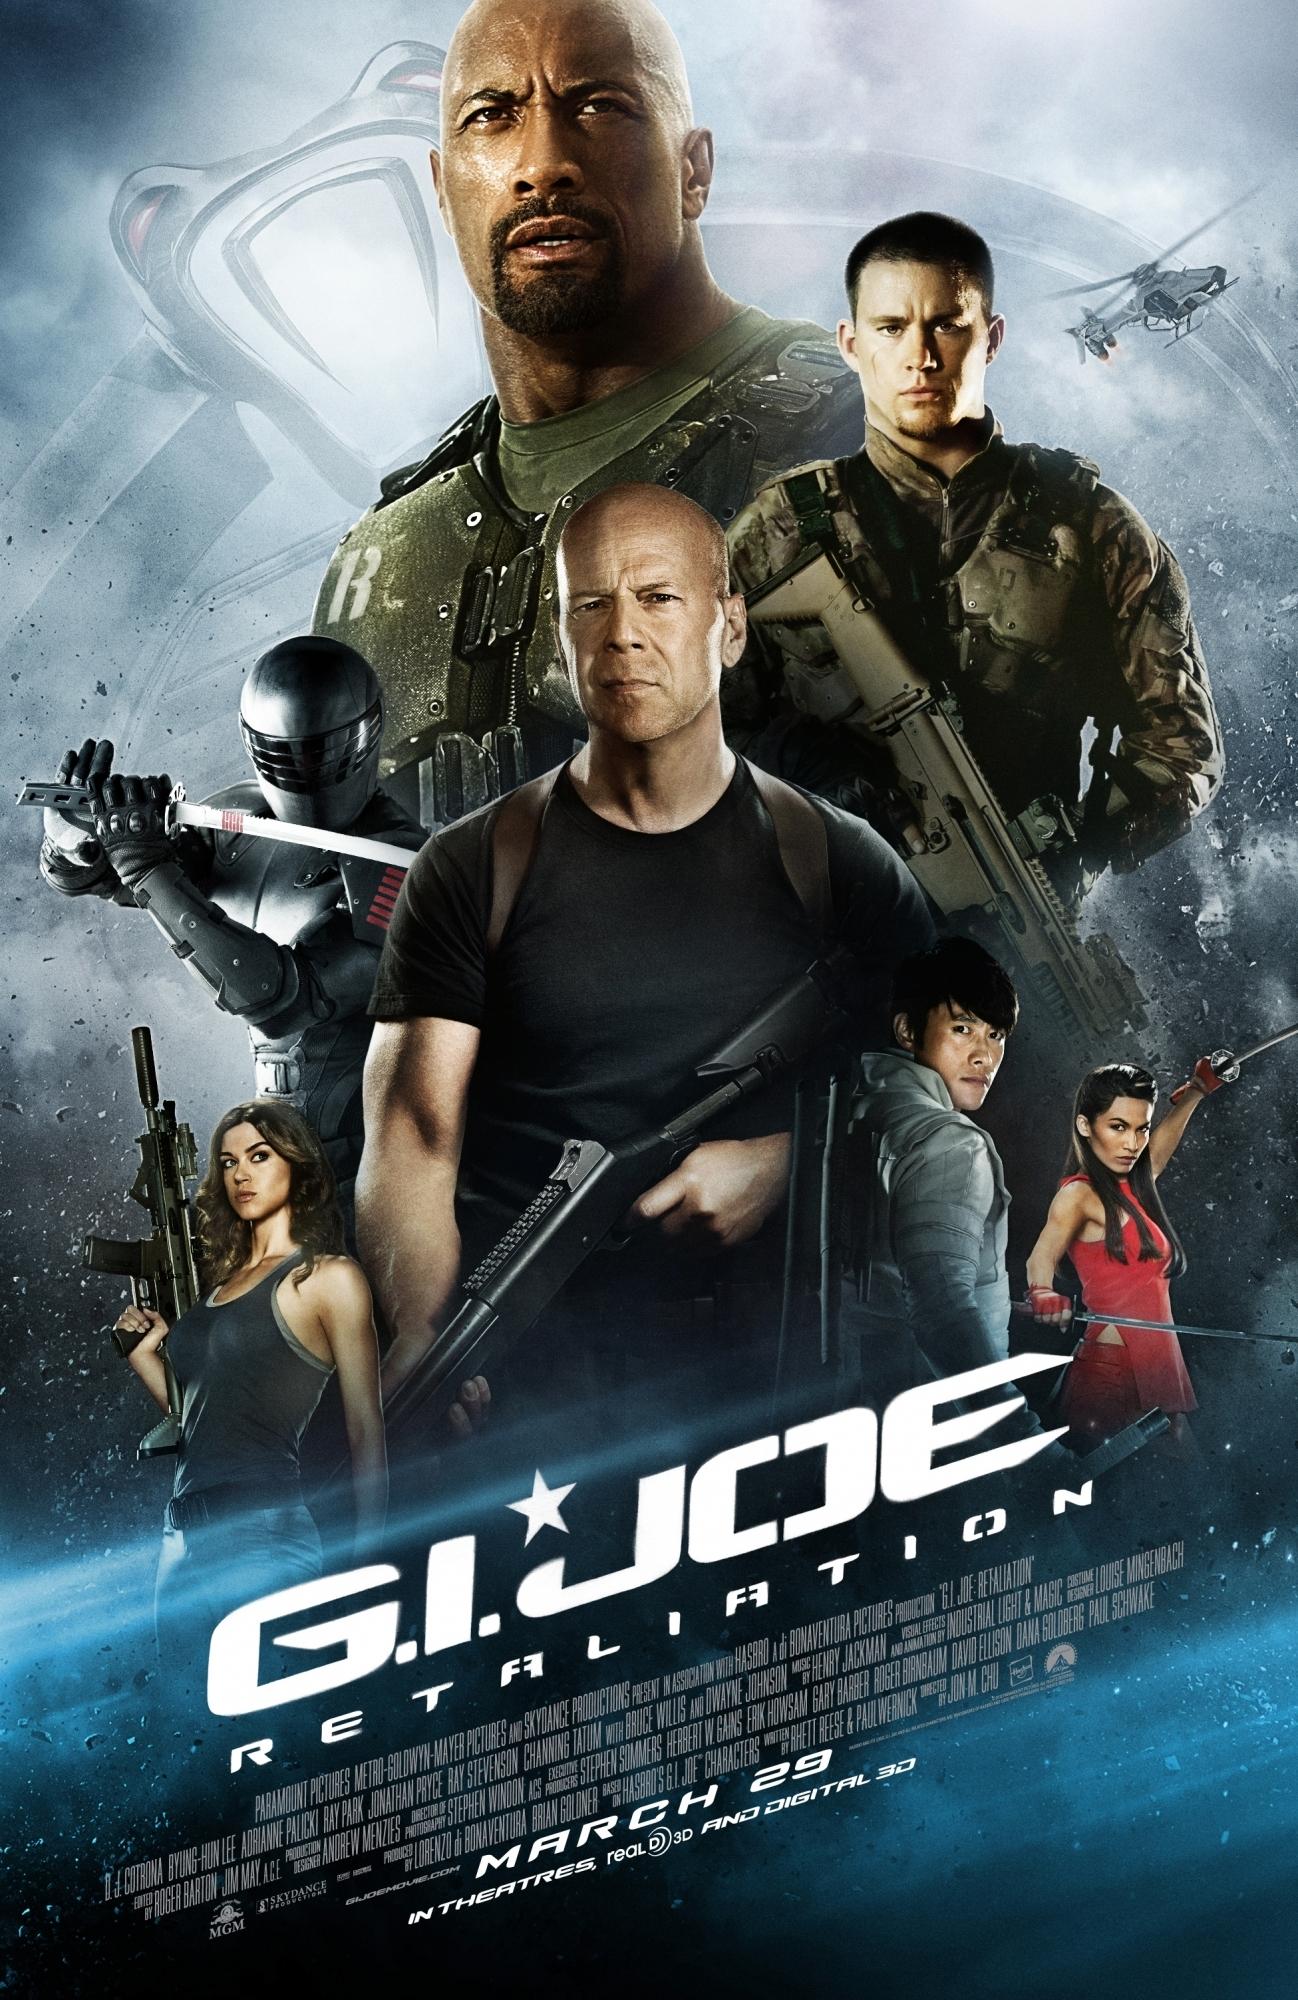 Image G.I. Joe: Retaliation Watch Full Movie Free Online